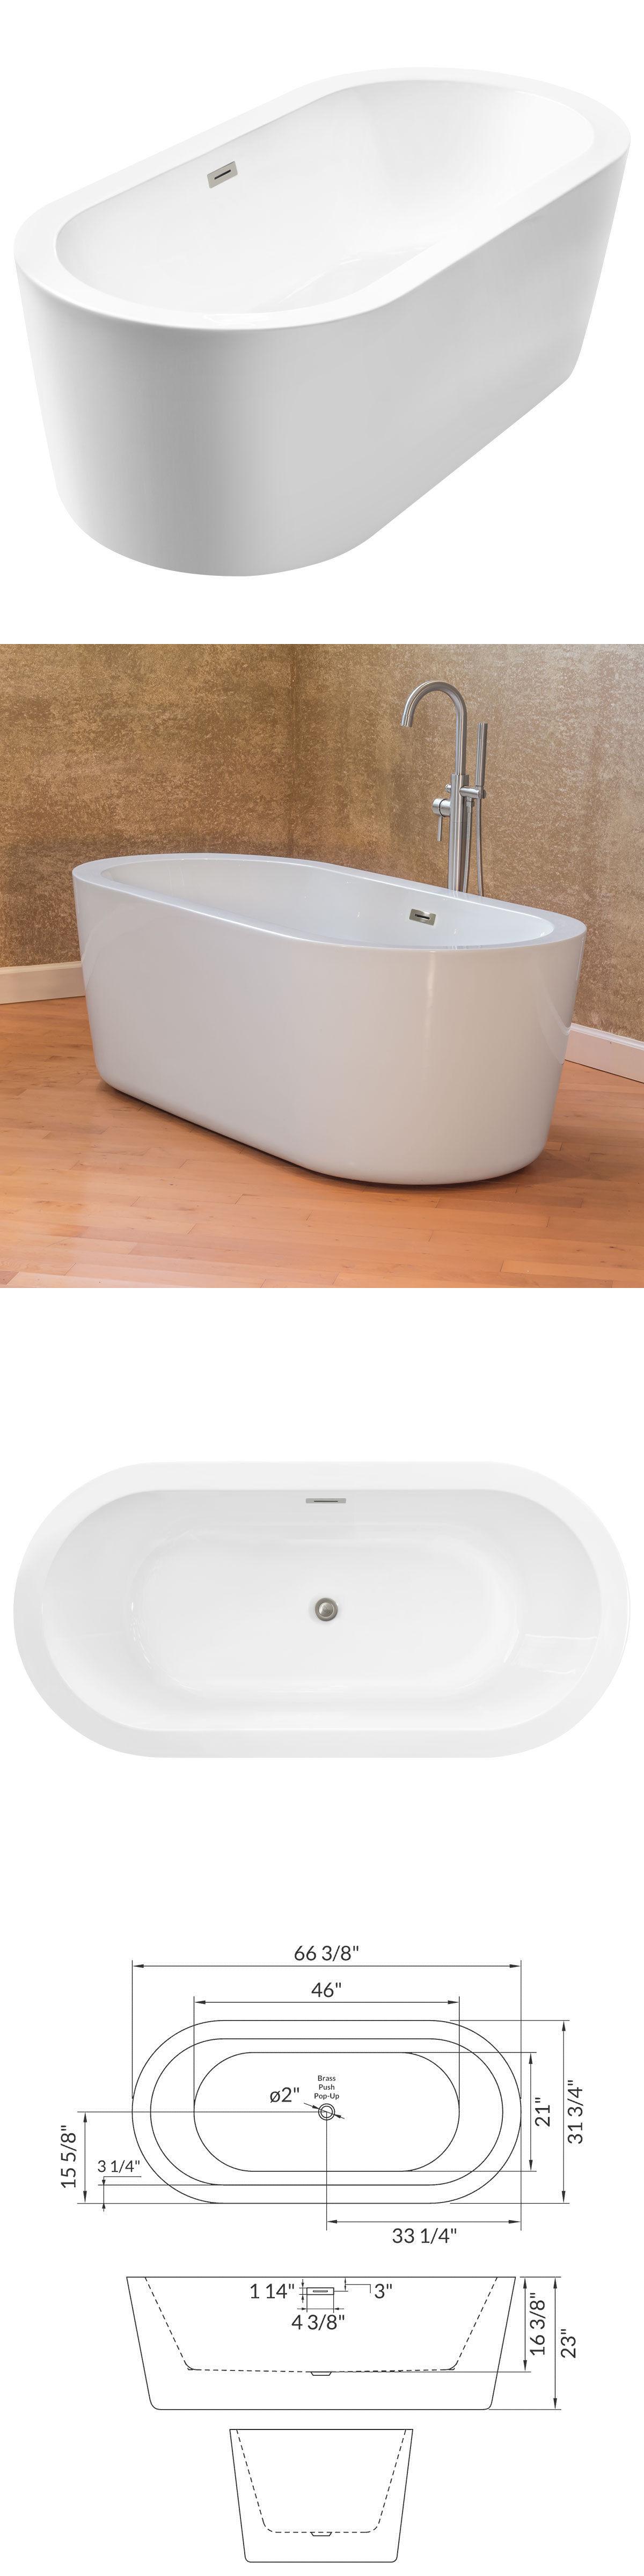 Bathtubs 42025: Lesscare Ltf1 67 Glossy White Acrylic Freestanding ...